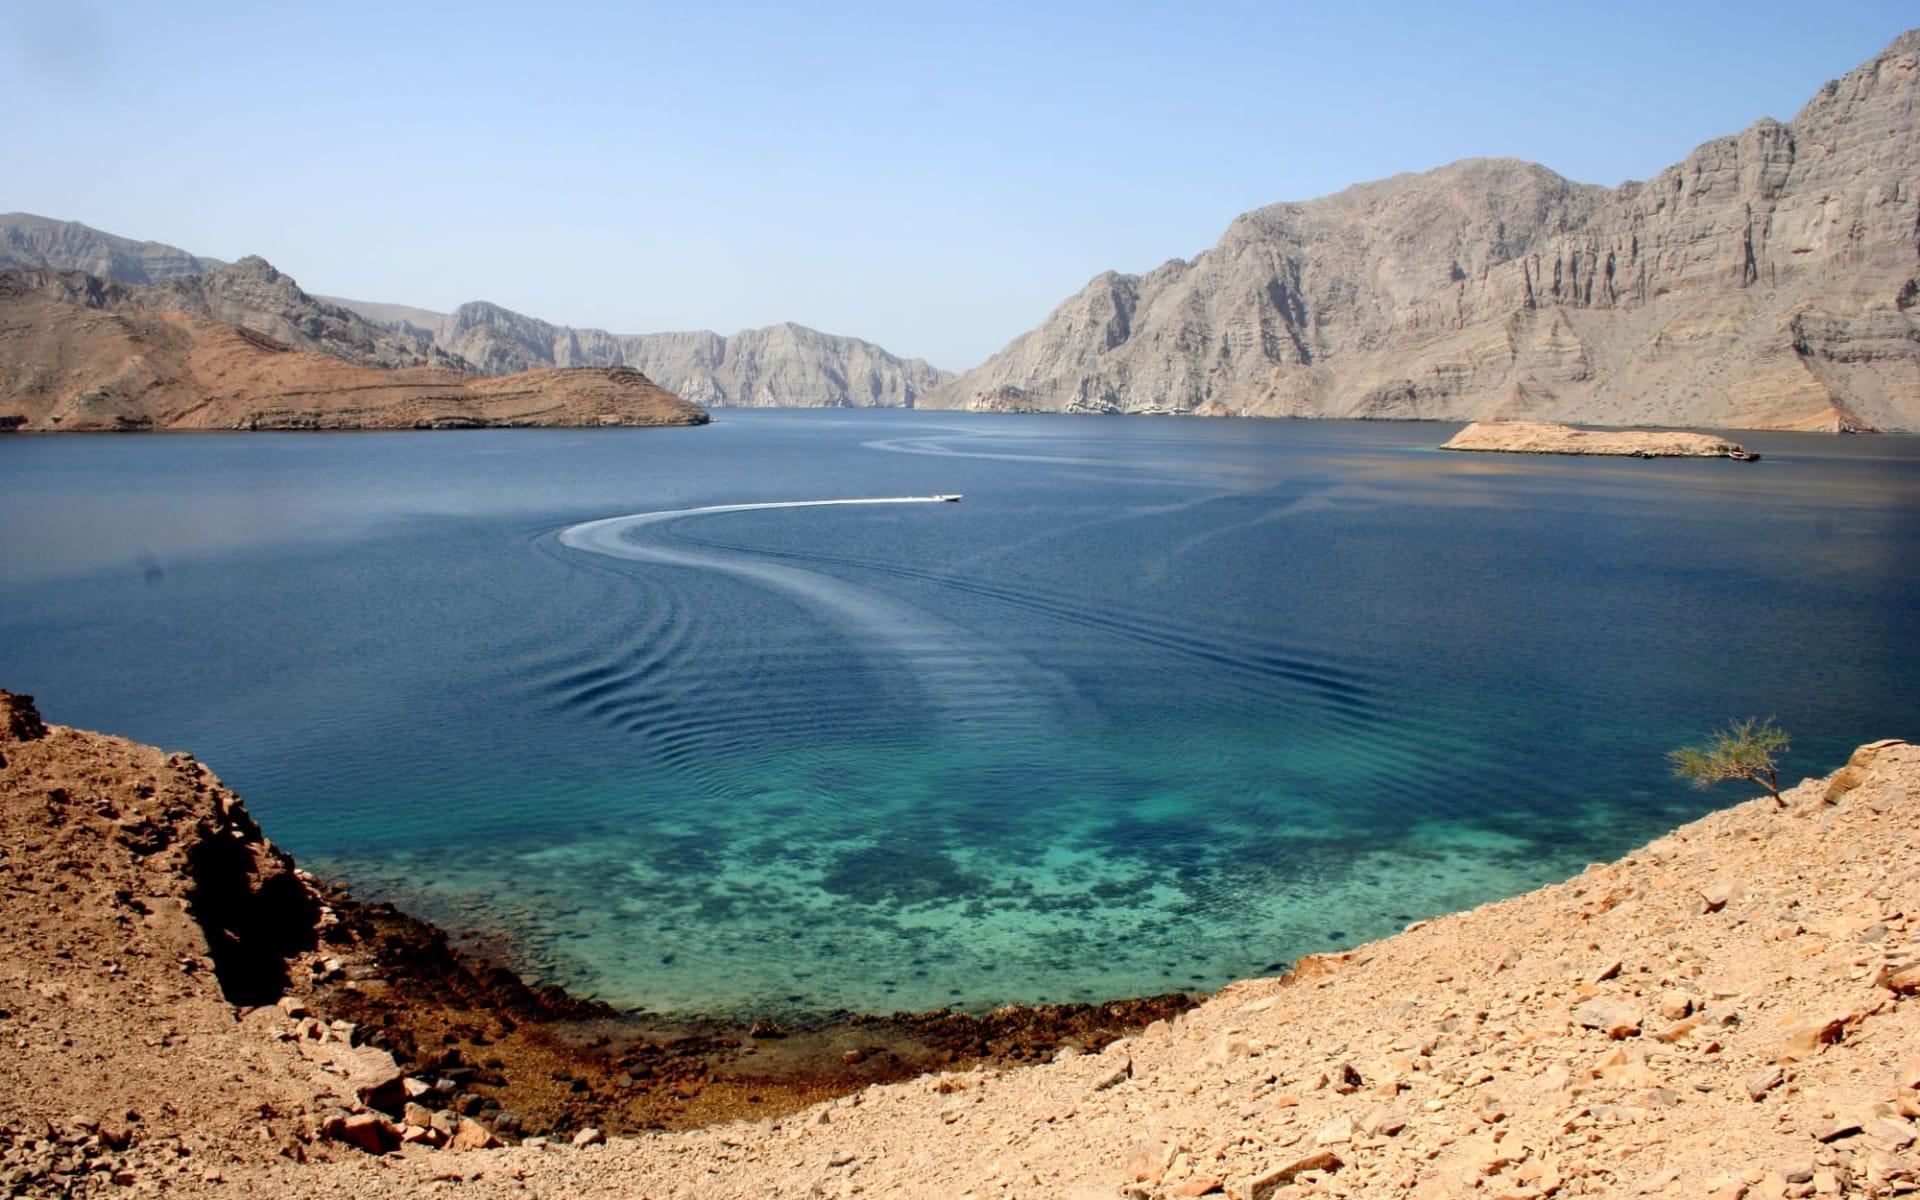 Omanische Exklave Musandam ab Muscat: Musandam - Oman